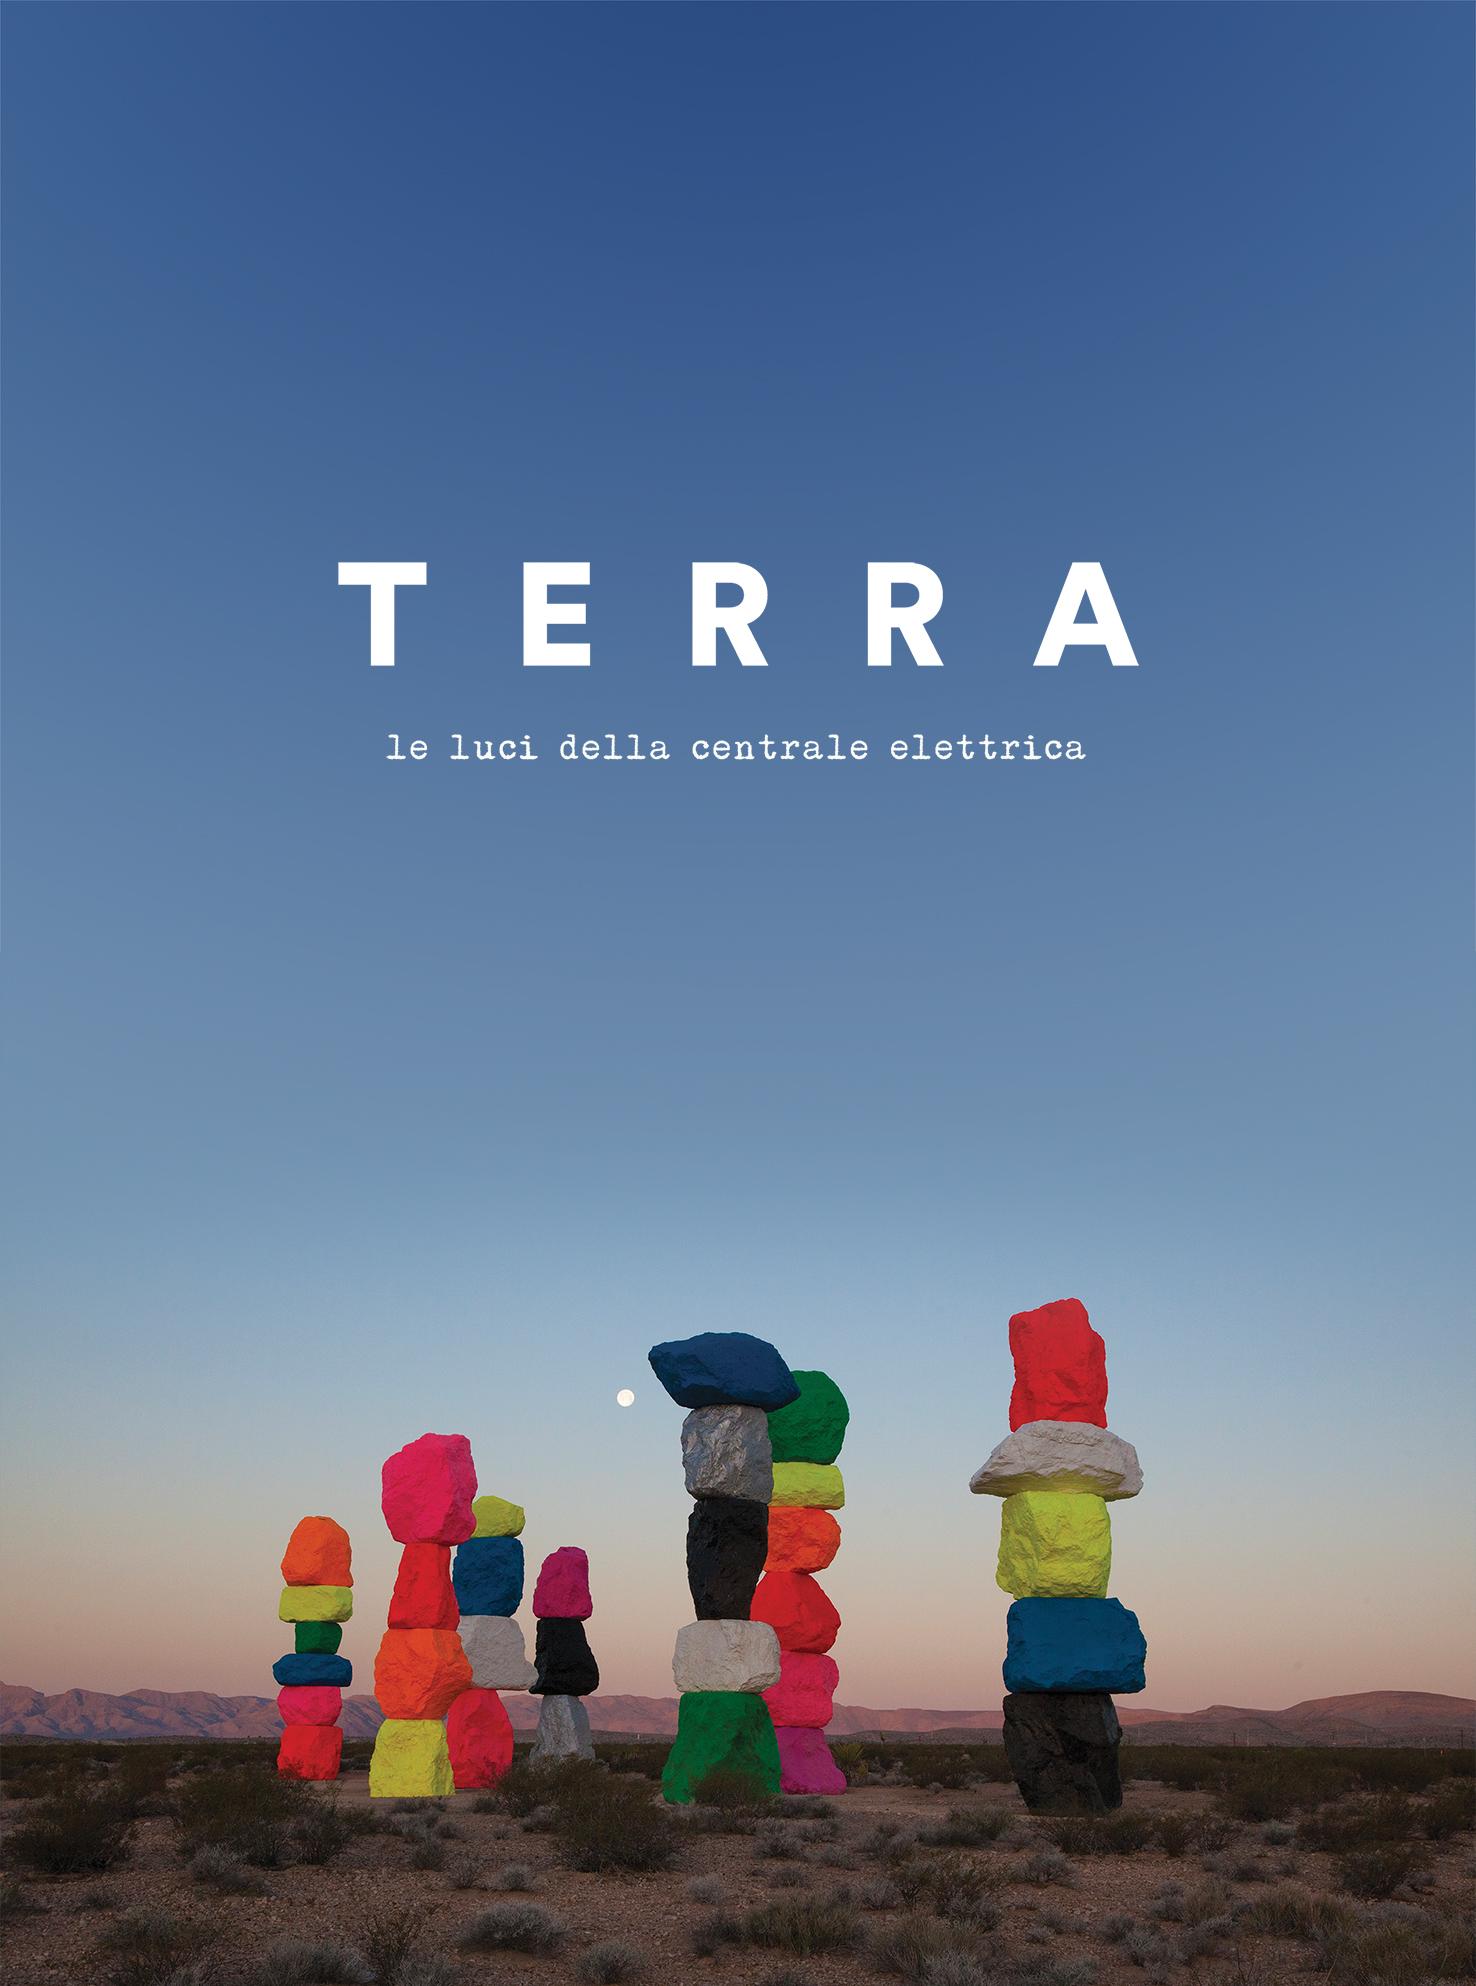 copertina_terra_lldce